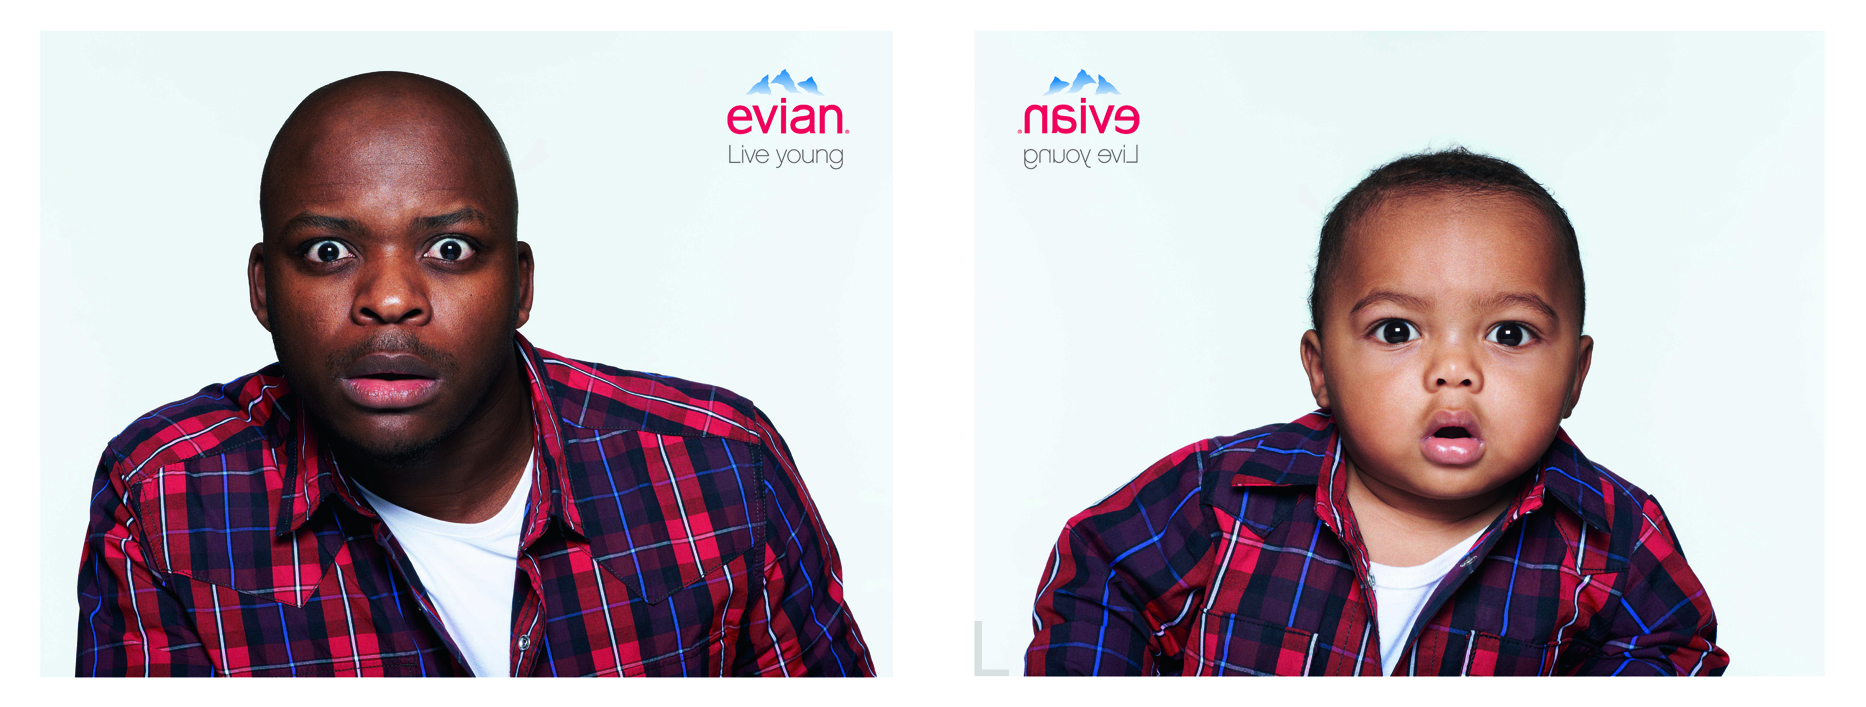 evian-baby&me_6